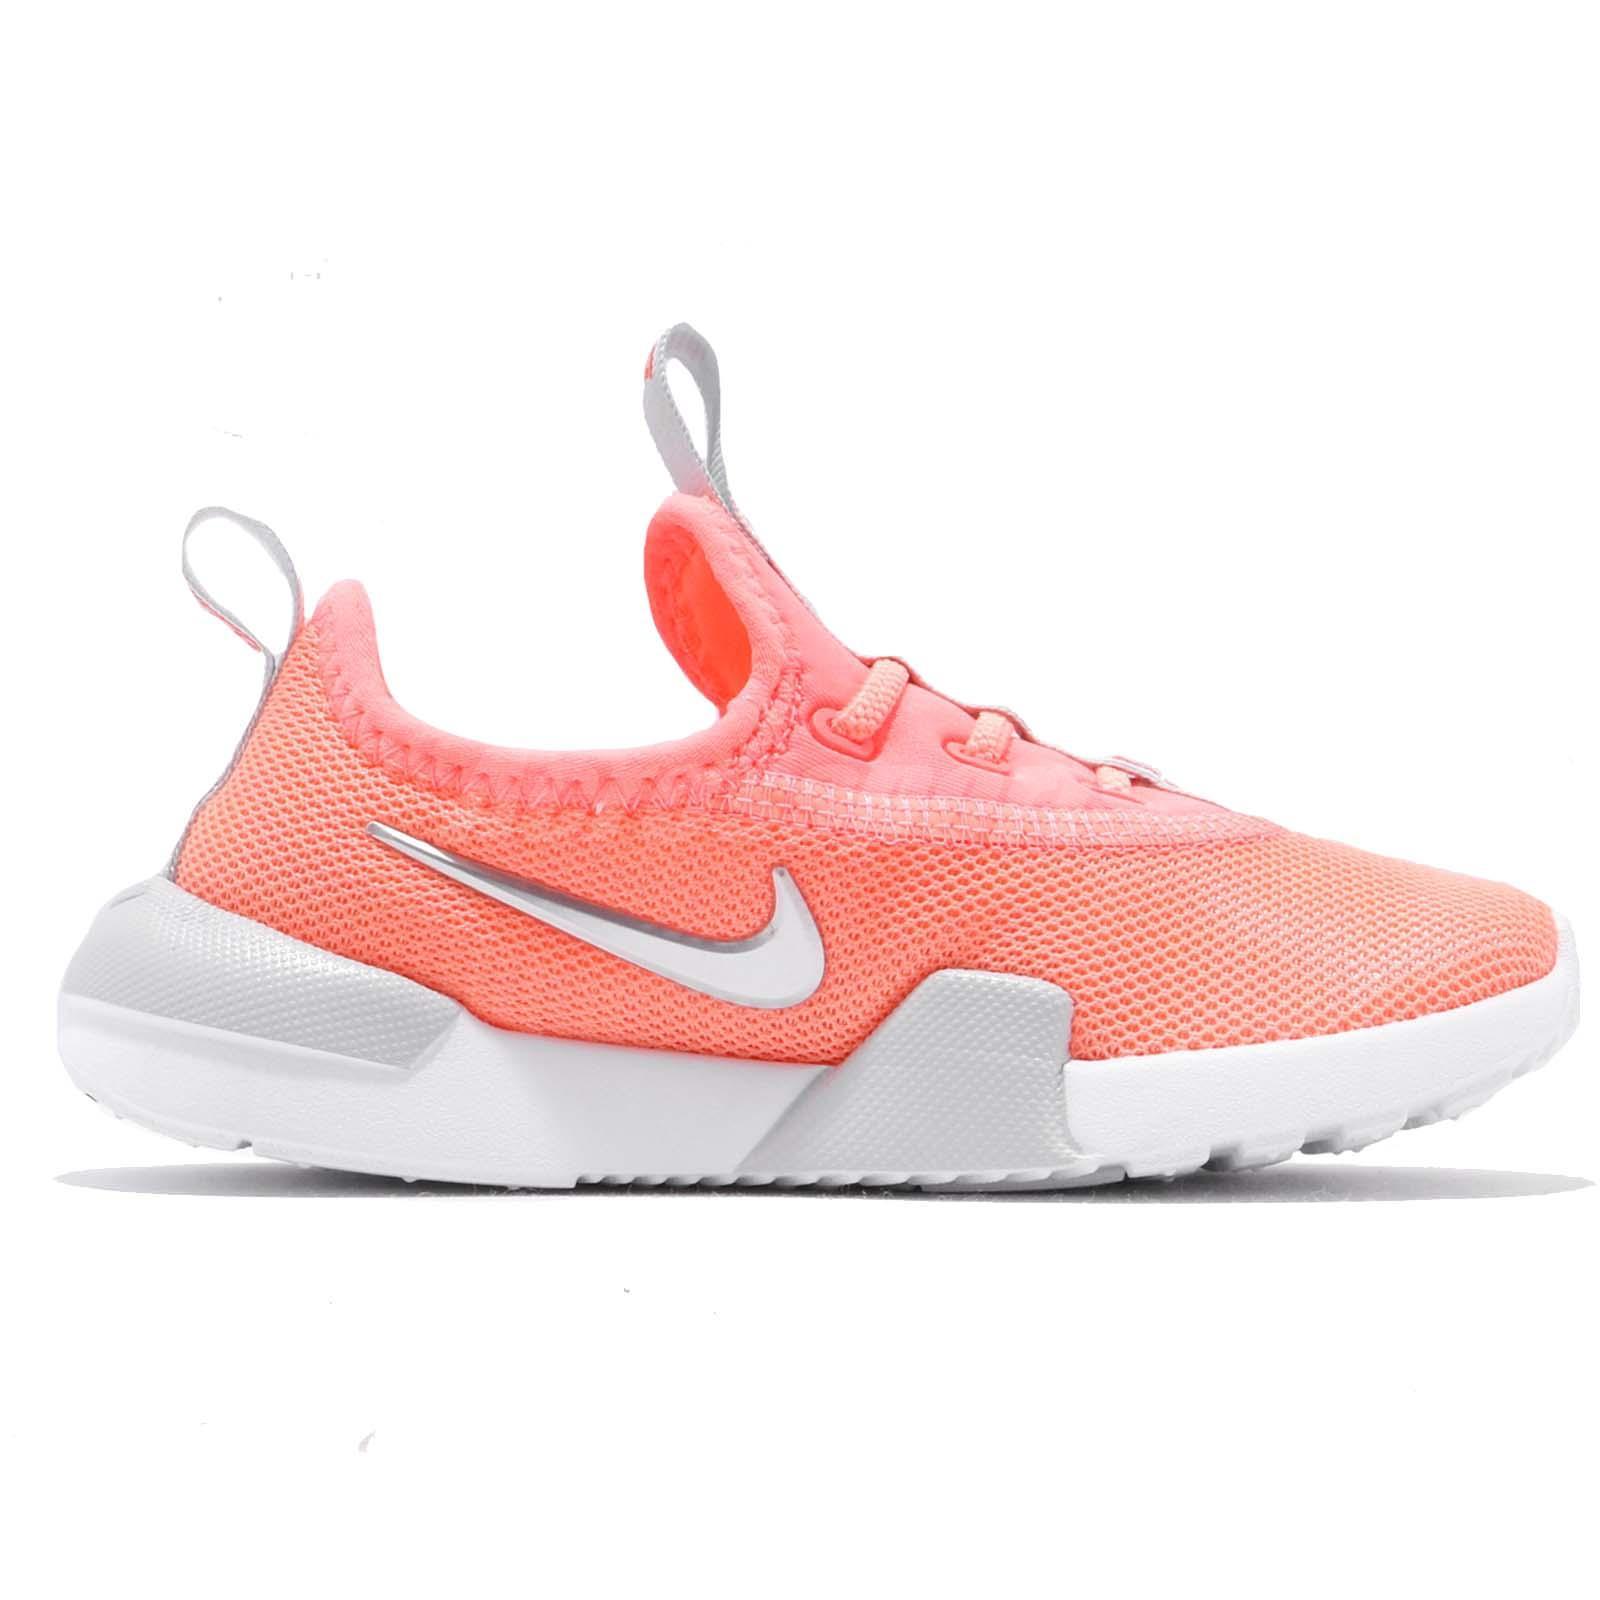 Agrícola Antorchas A bordo  Nike Ashin Modern TD Pink Silver Toddler Infant Running Shoes Sneaker  AO1687-600 | eBay